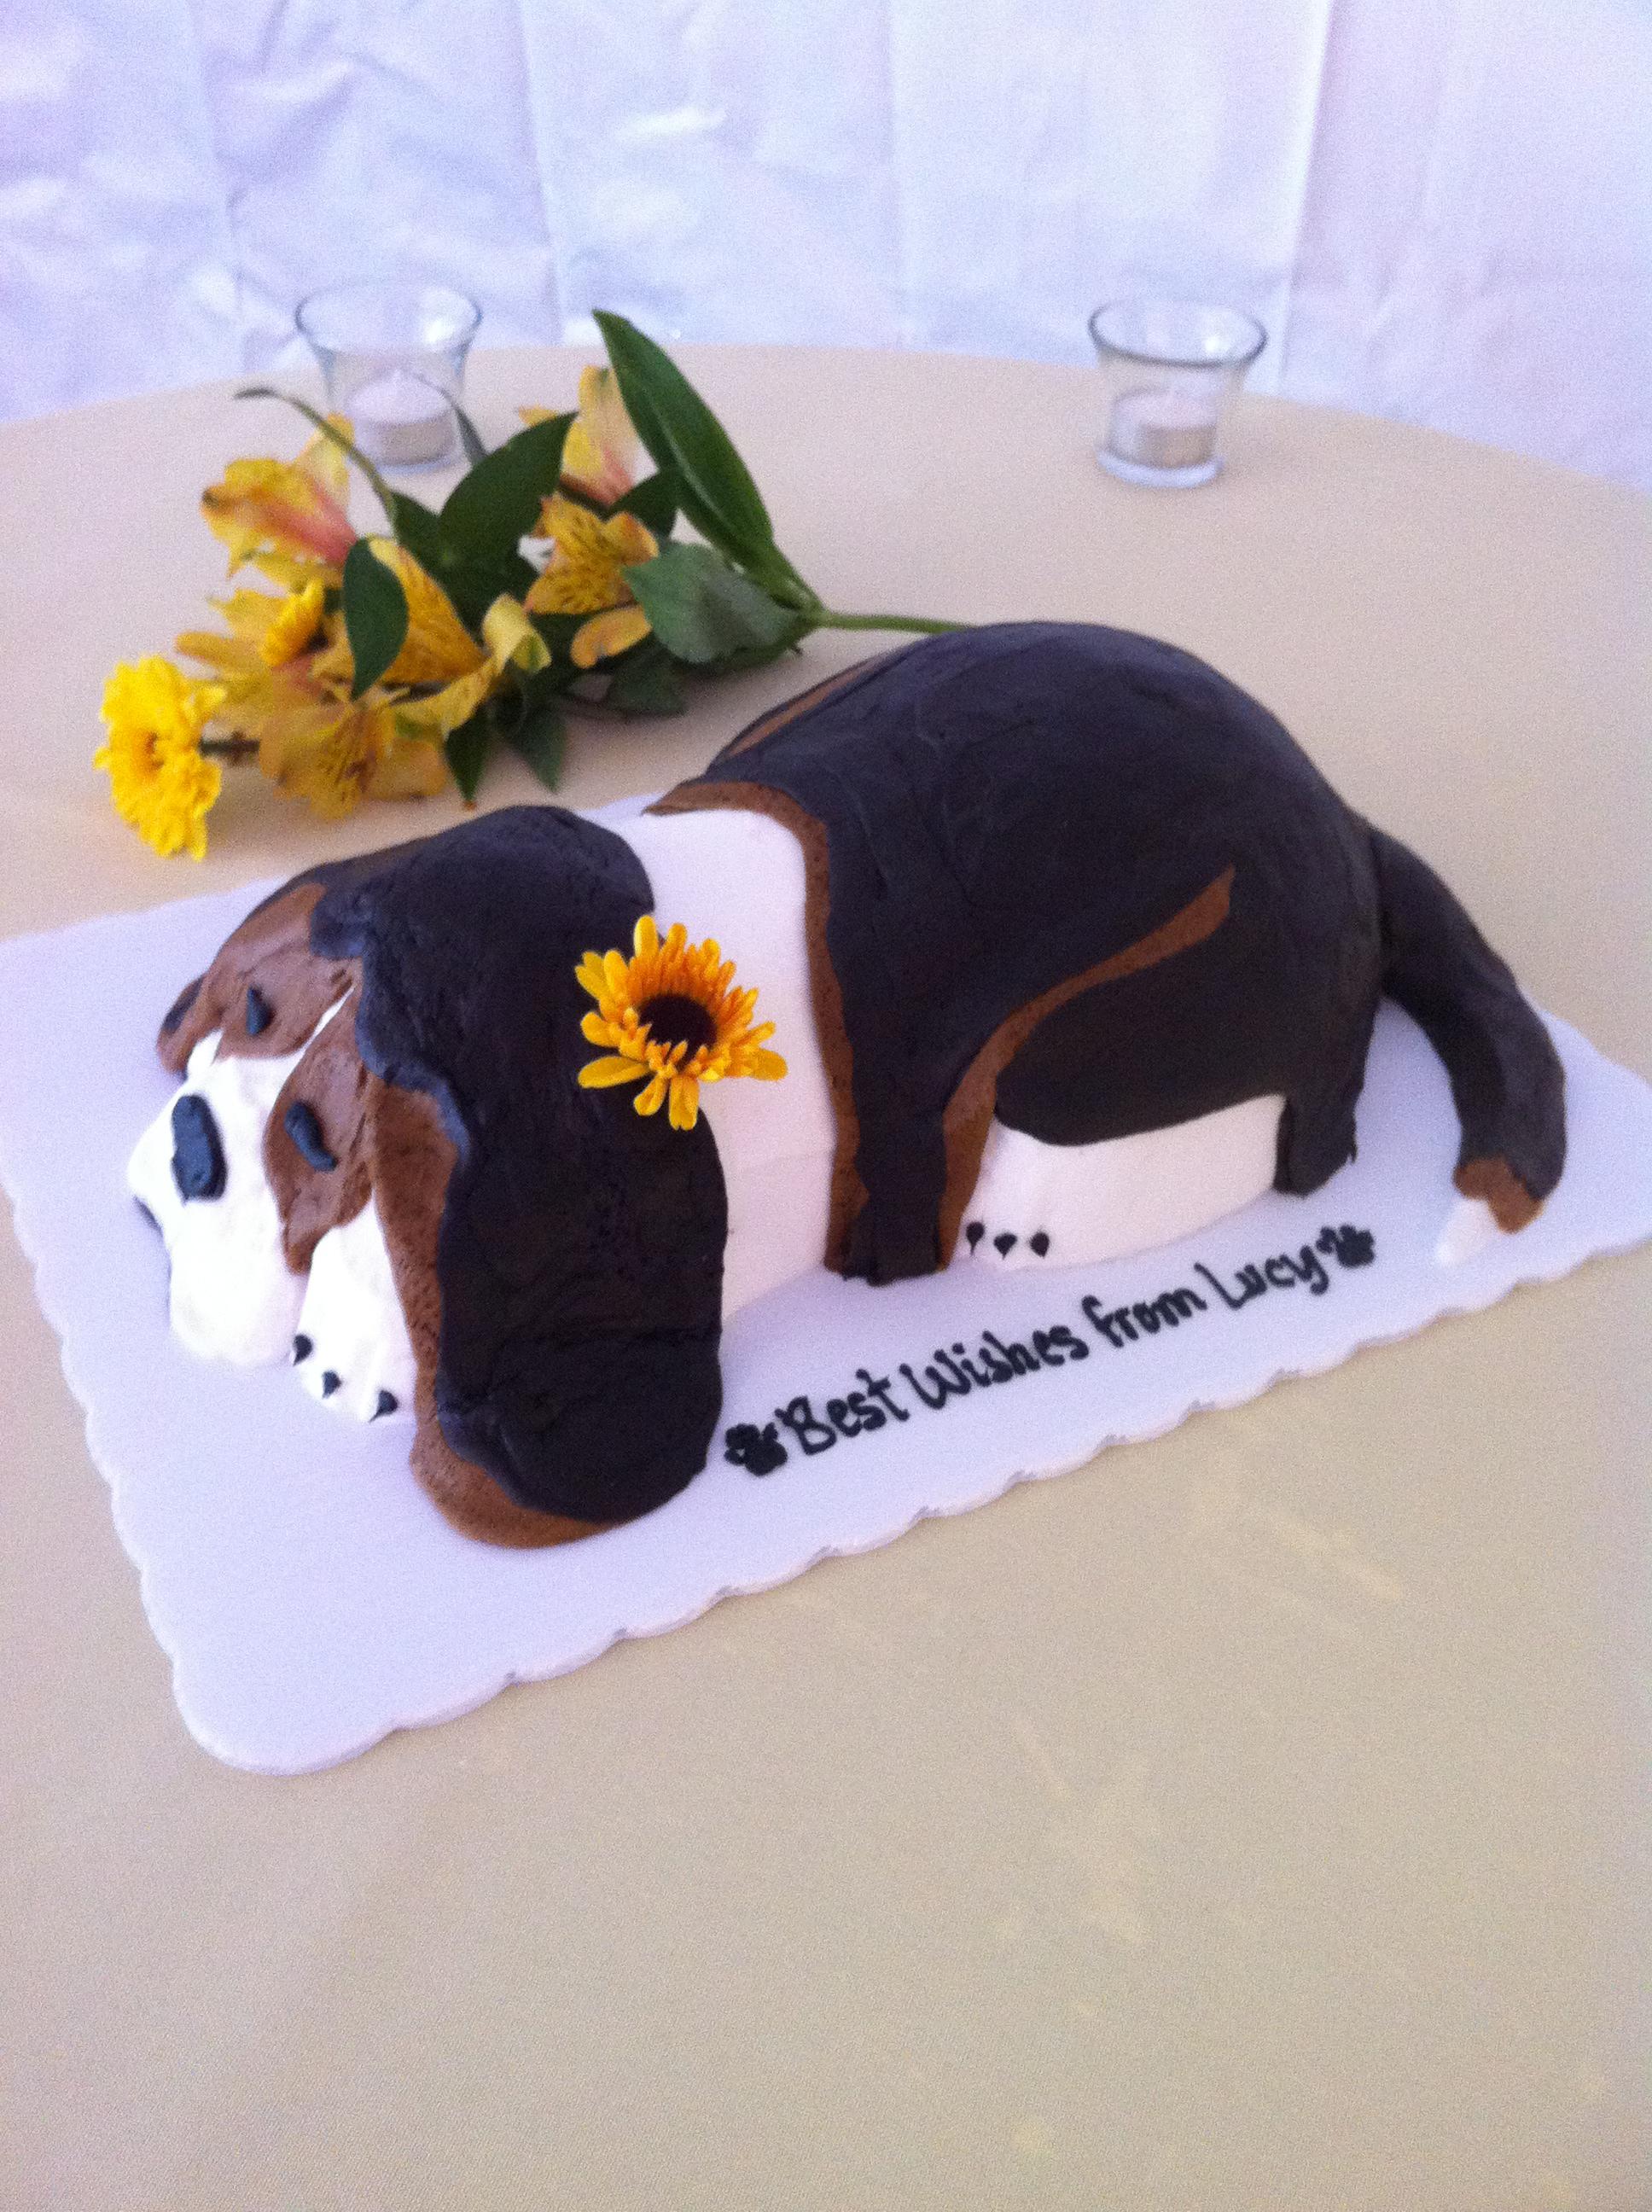 Beagle Shaped Cake